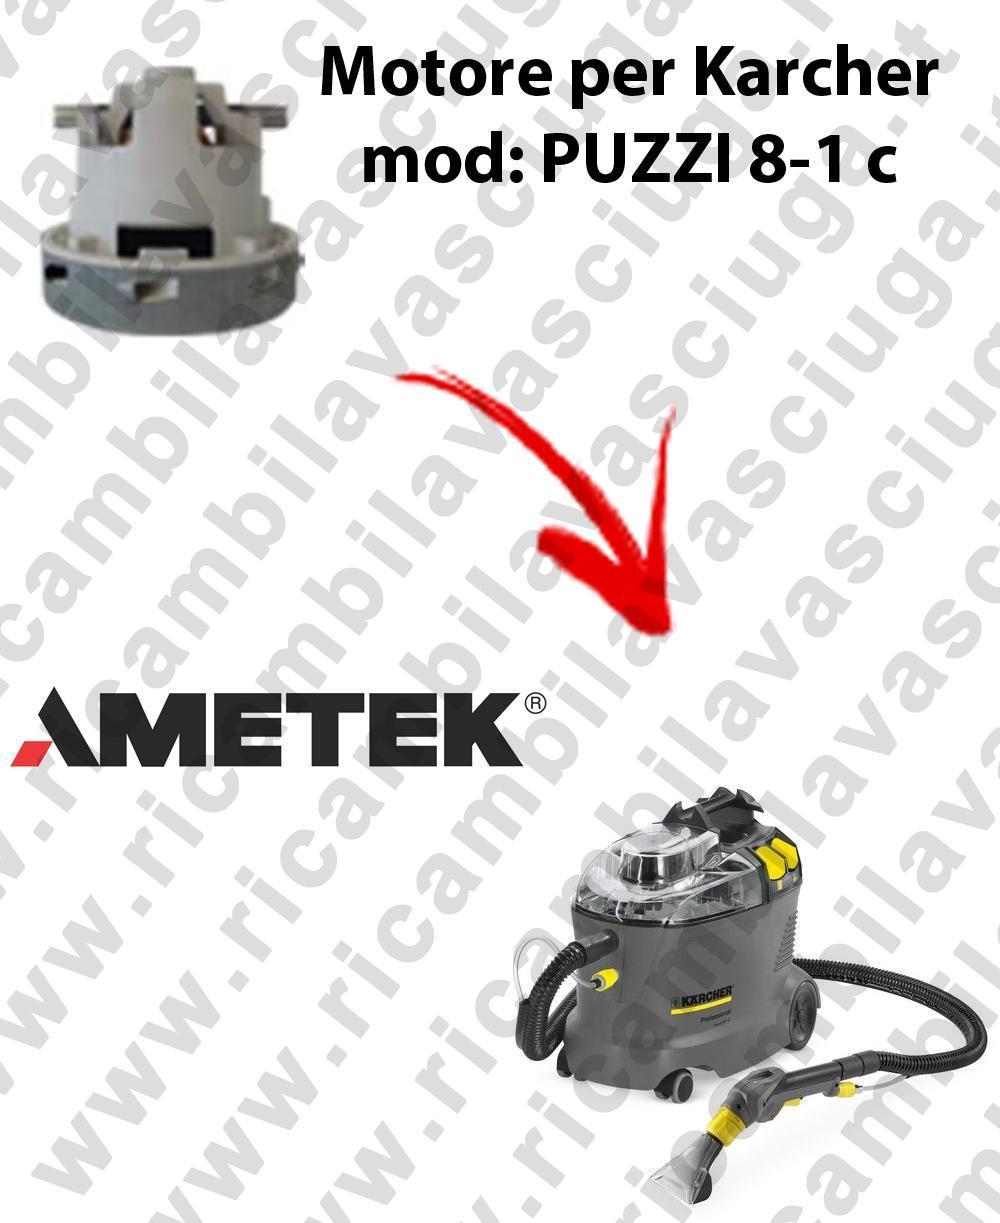 PUZZI 8-1 C Motore de aspiración AMETEK para aspiradora KERCHER